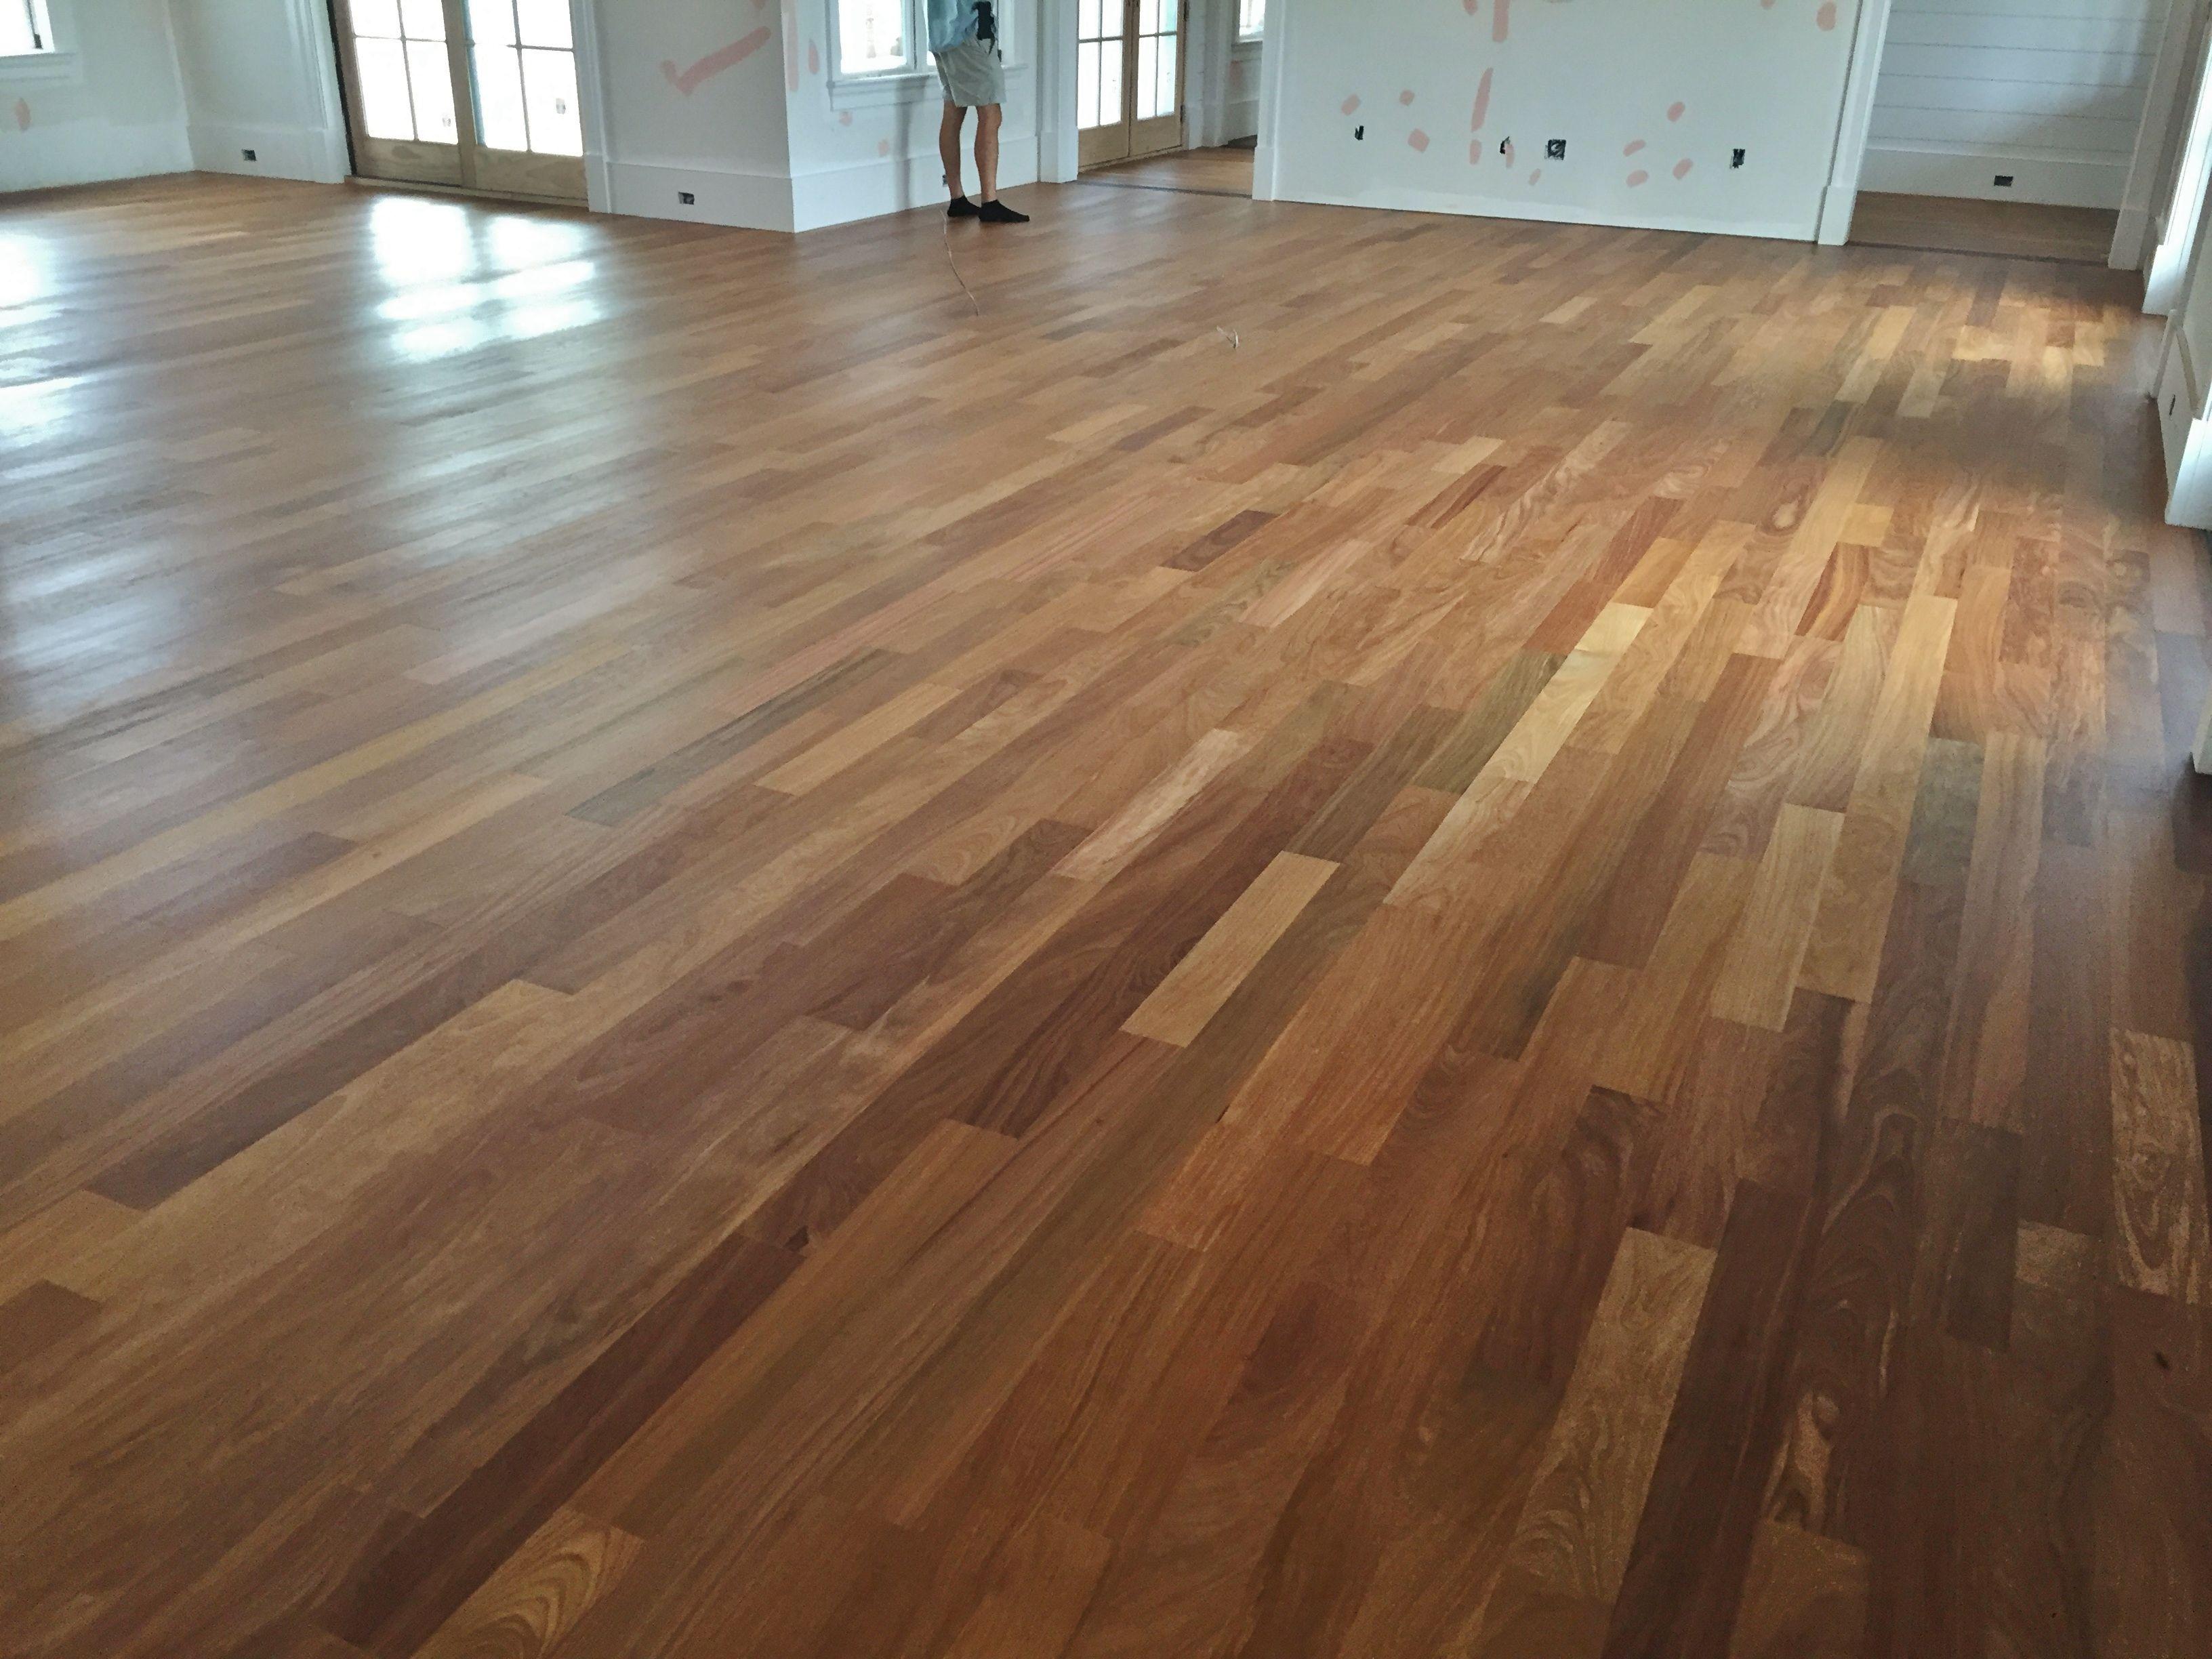 national classic toronto product flooring engineered hardwood image floor oak collection brampton white red coal mississauga